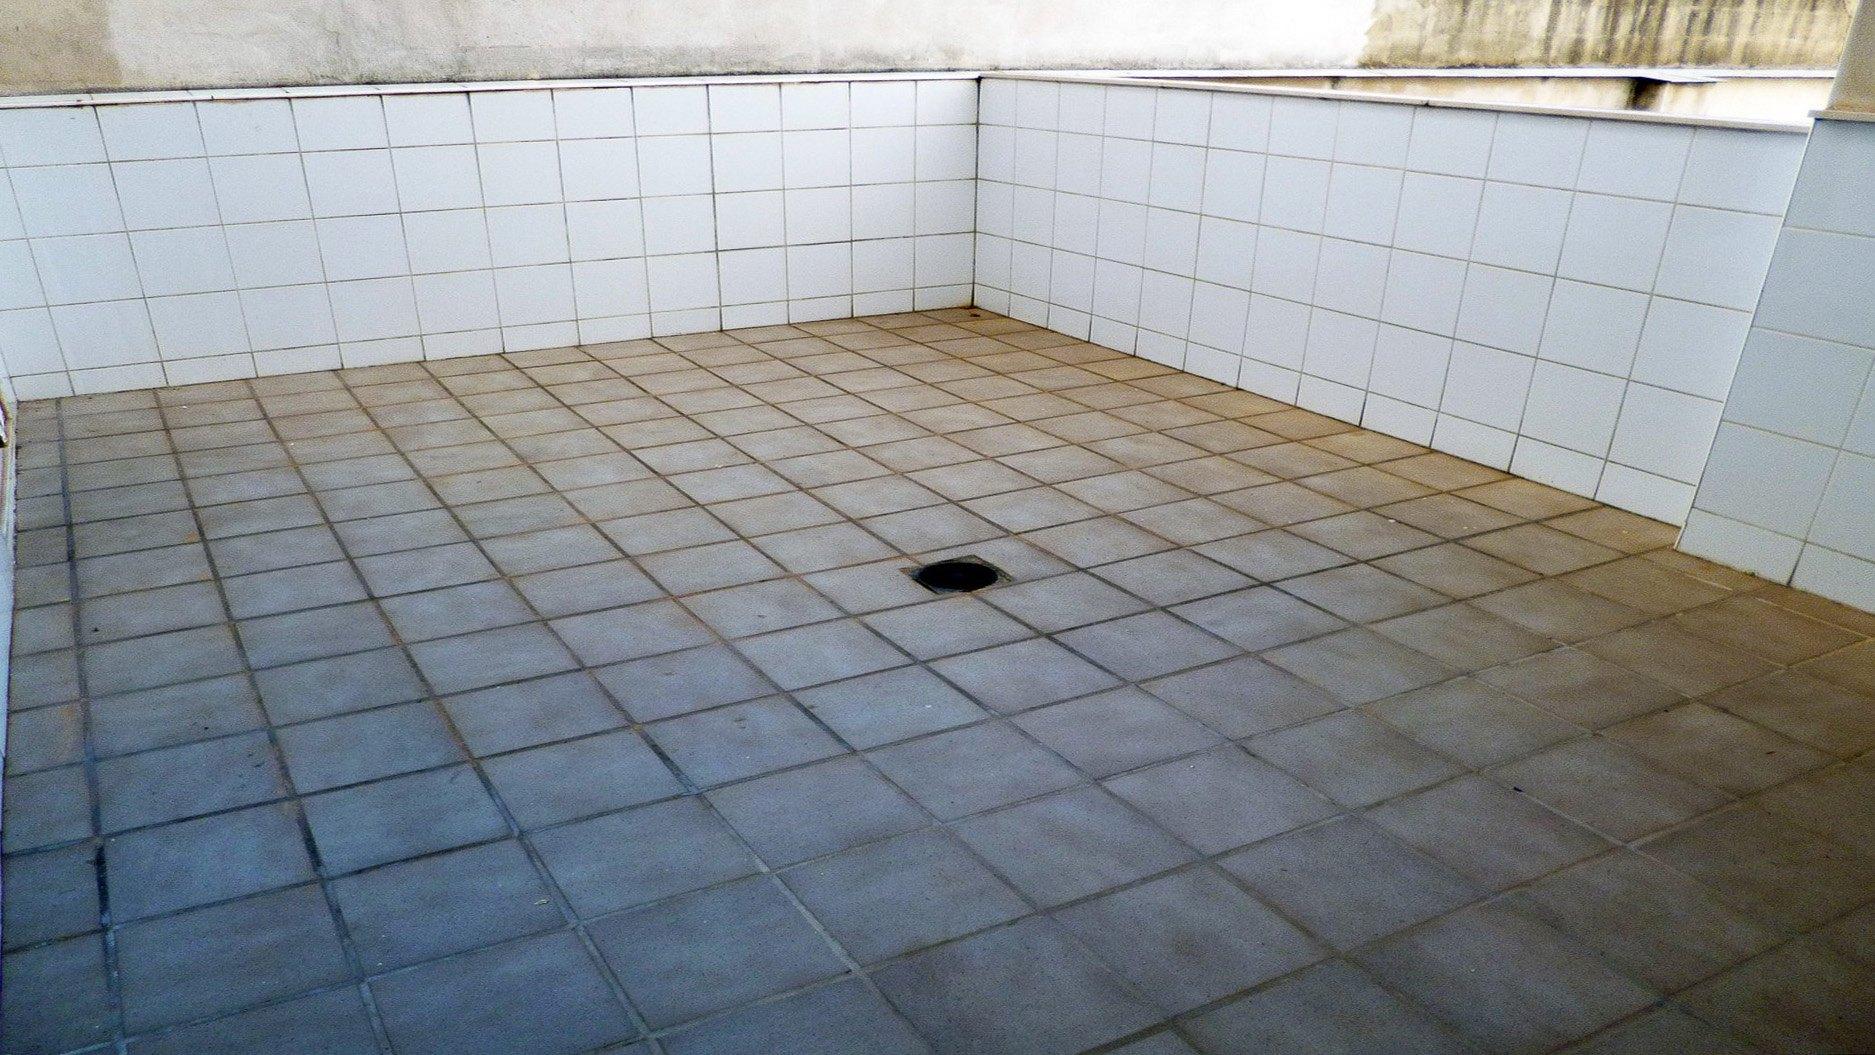 vitalcasa-propiedades_54621ffe9b2fb-source